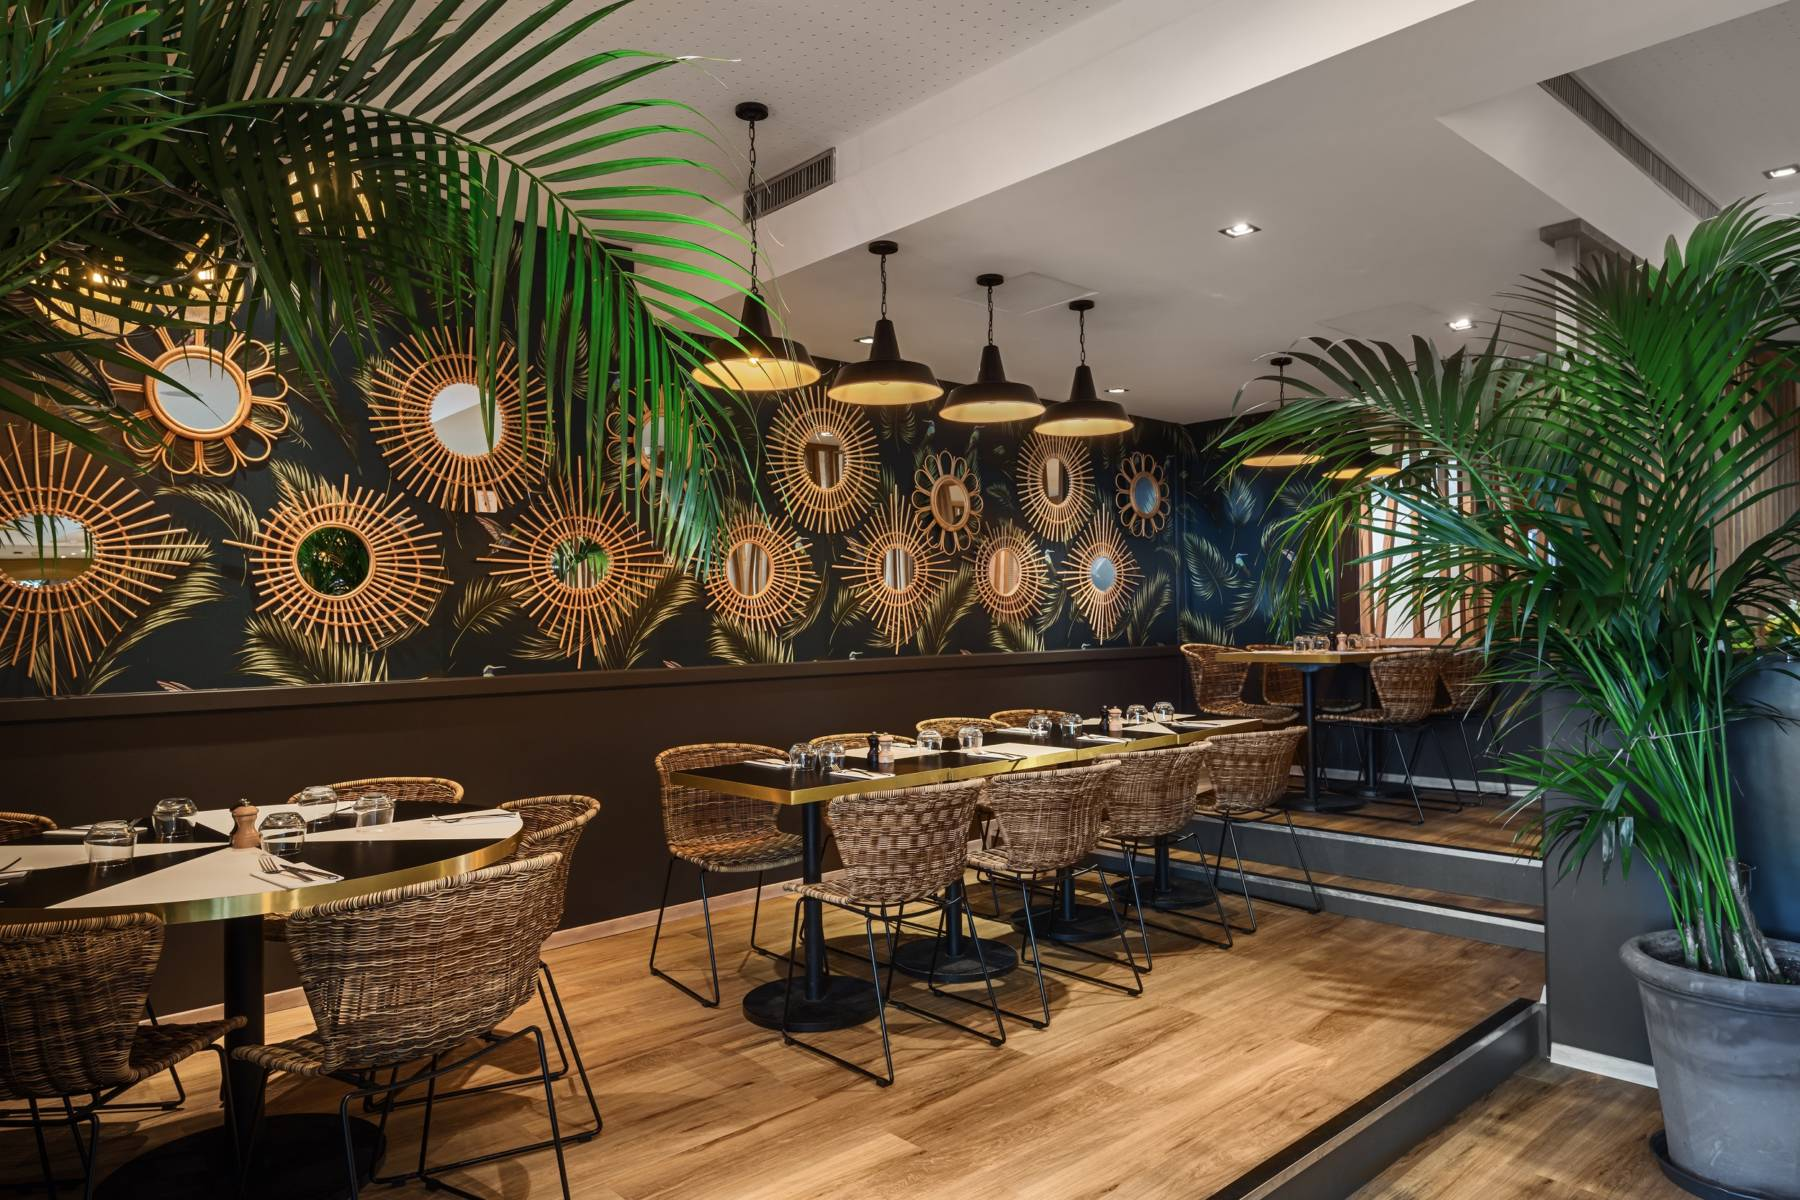 Restaurant La Brasserie des Artistes, musée des impressionnismes Giverny